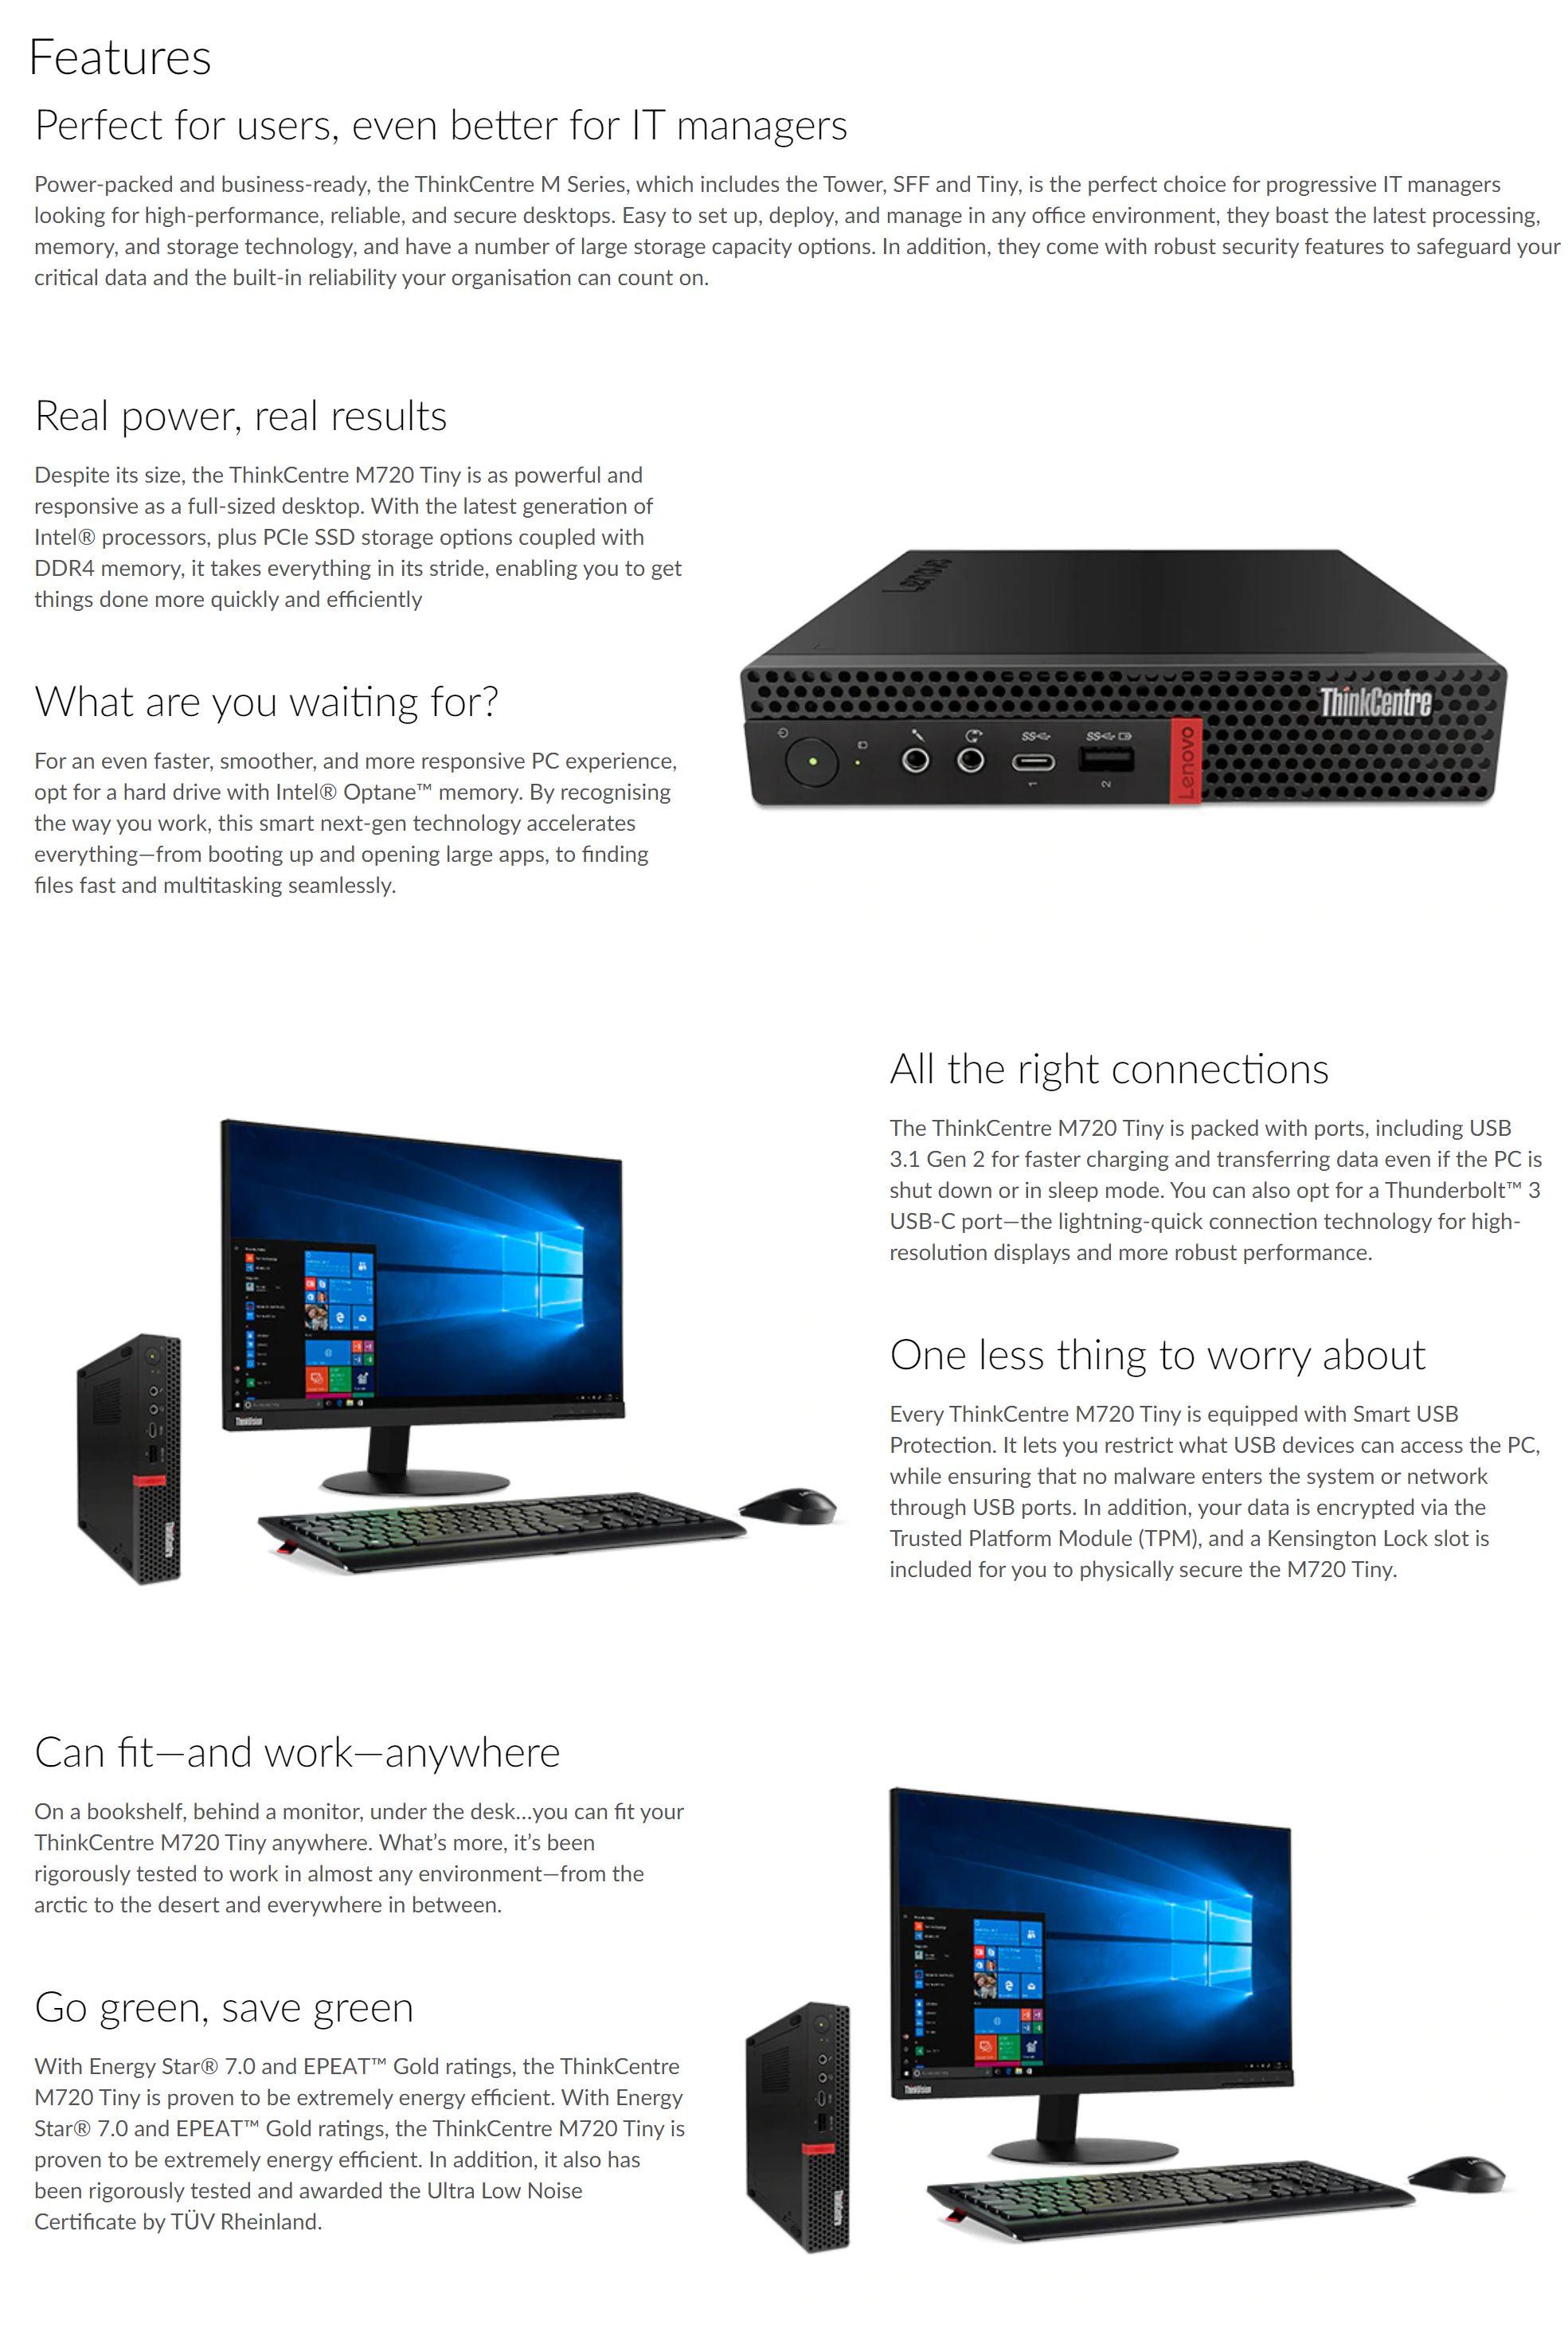 #1723 - 'ThinkCentre M720 Tiny I 8th Gen Intel Processor Desktop I Lenovo Australia' - www_lenovo_com.jpg